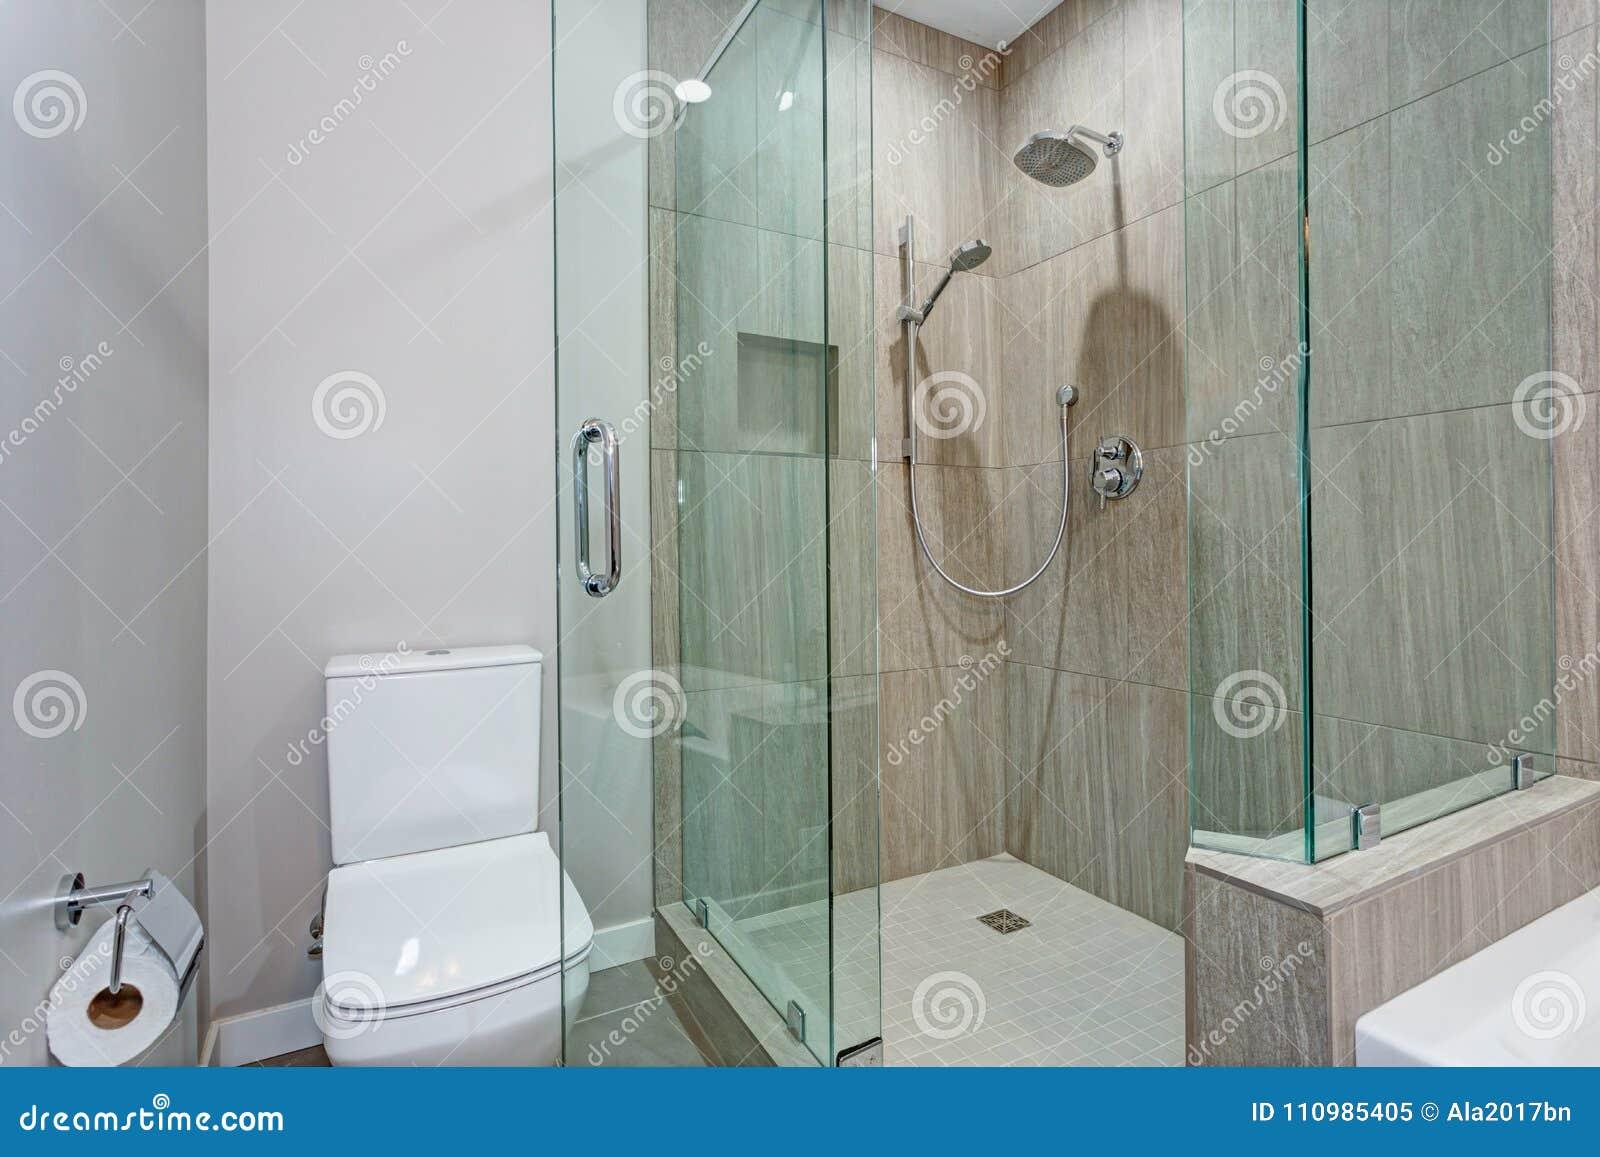 Stylish Bathroom Interior With Glass Walk In Shower Stock